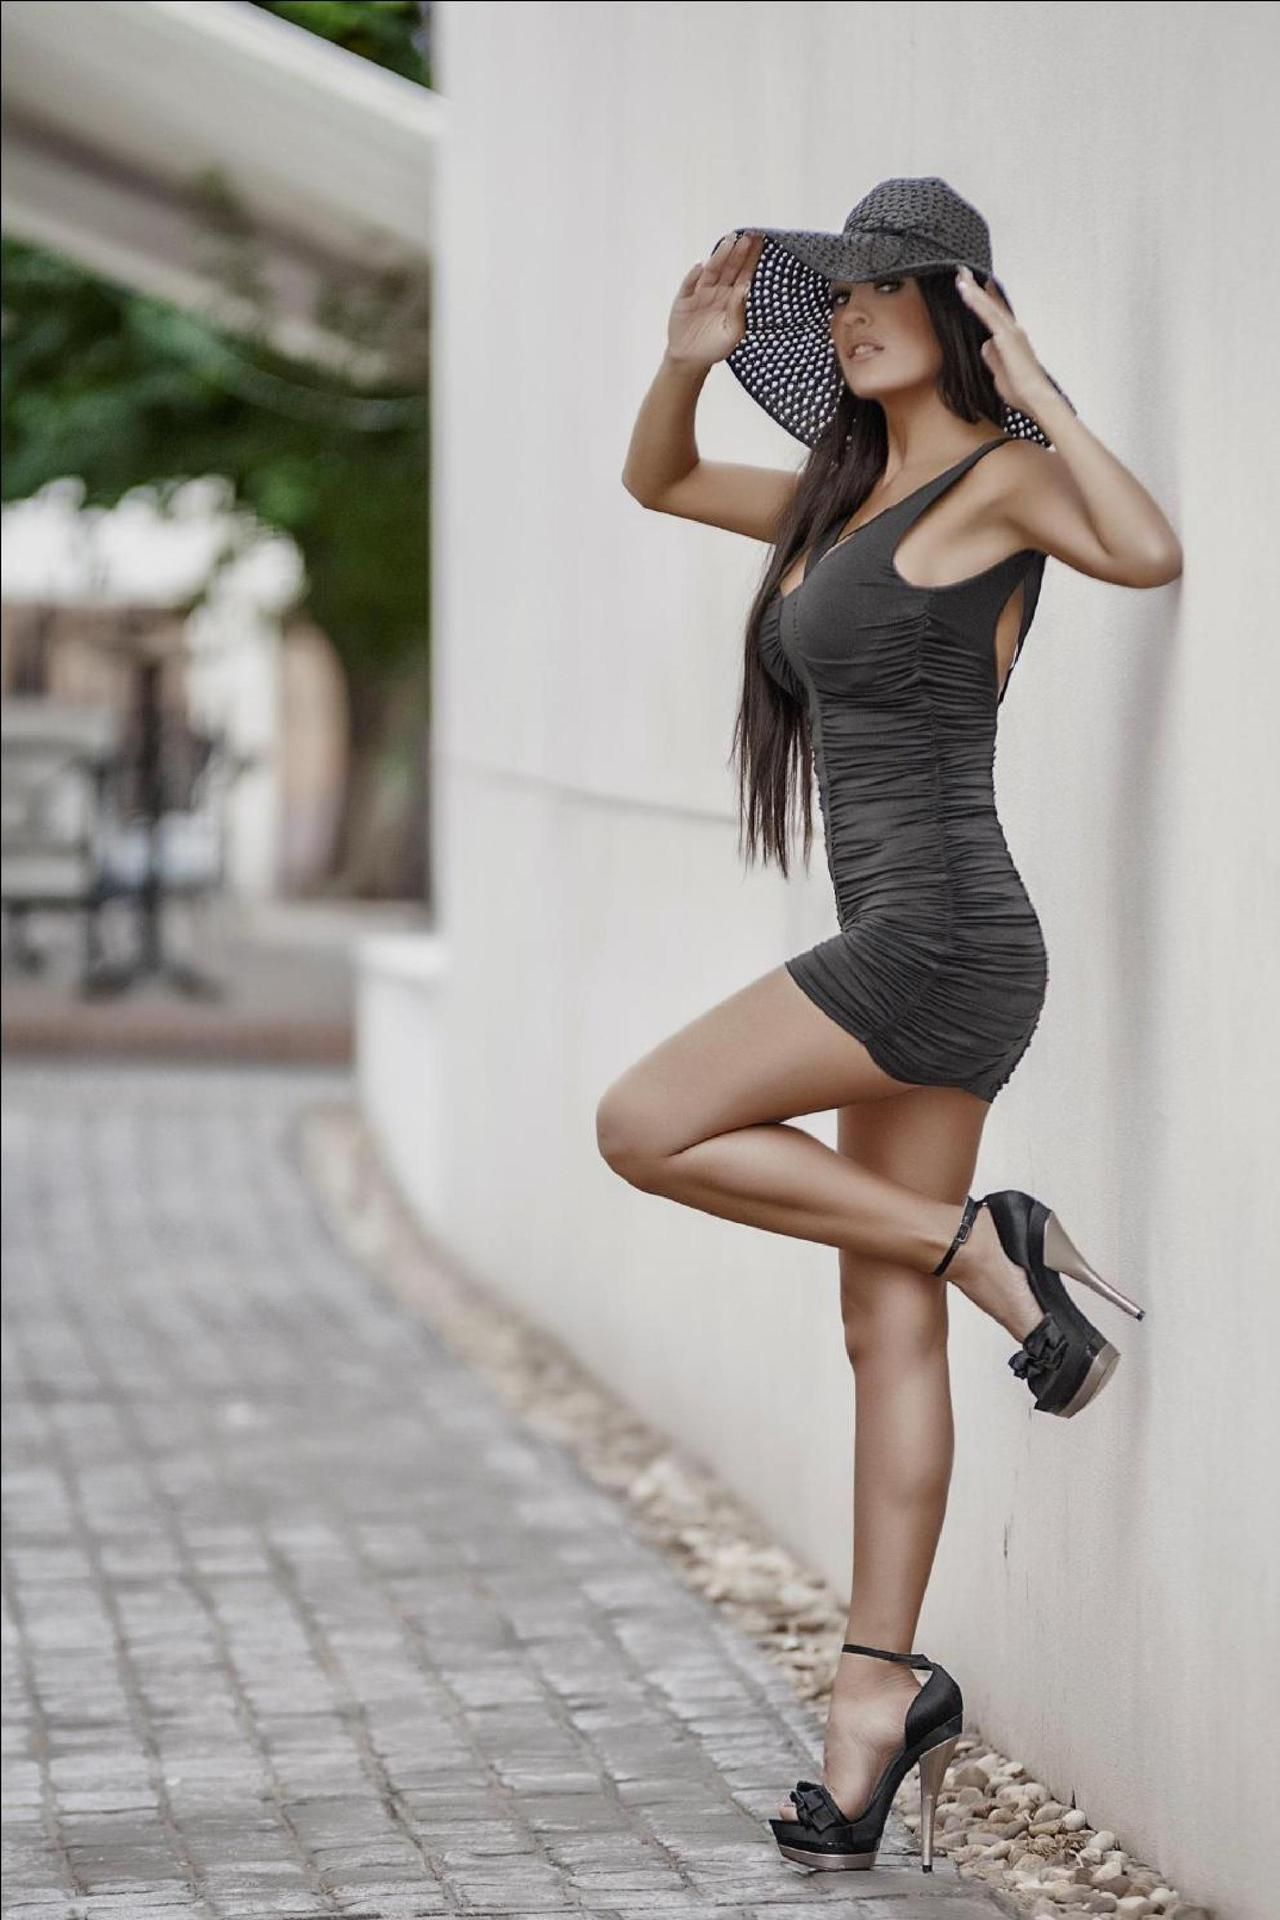 Popular HighHeelsModelBabe  High Heels Babe  Pinterest  Sexy Focus On